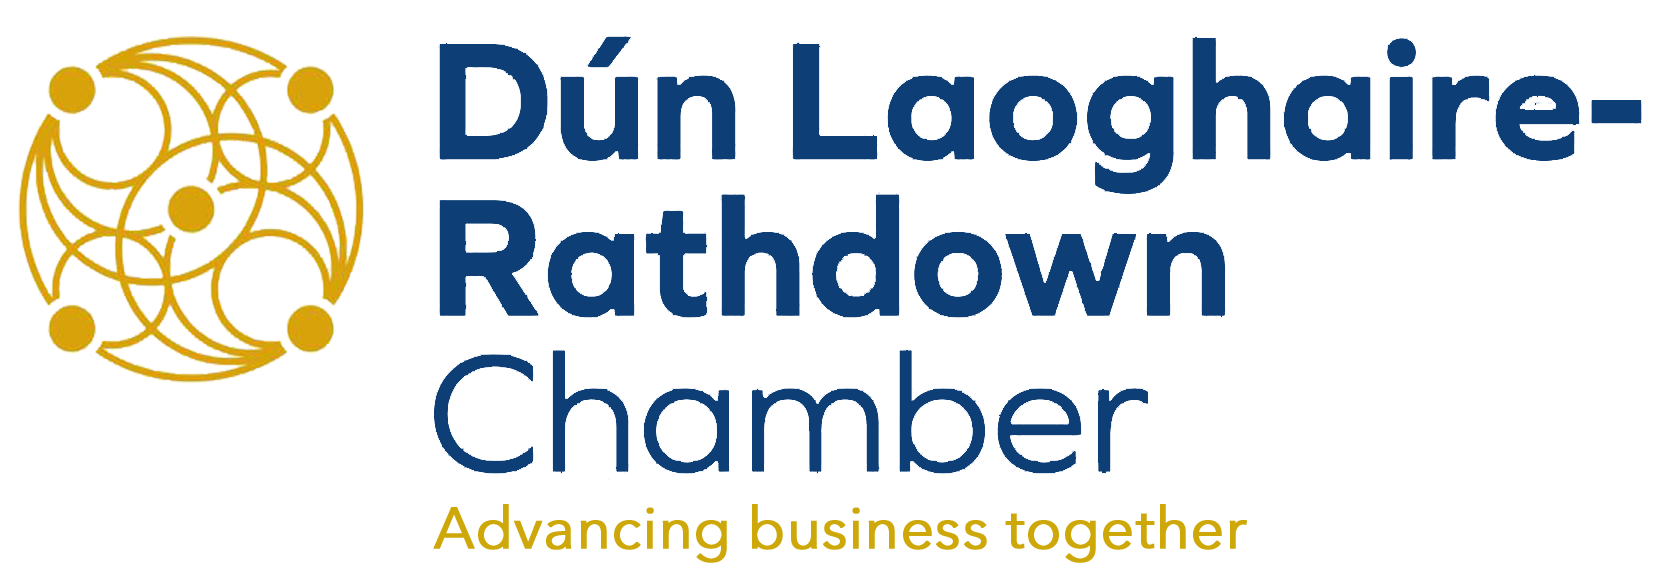 dlr chamber logo and strapline